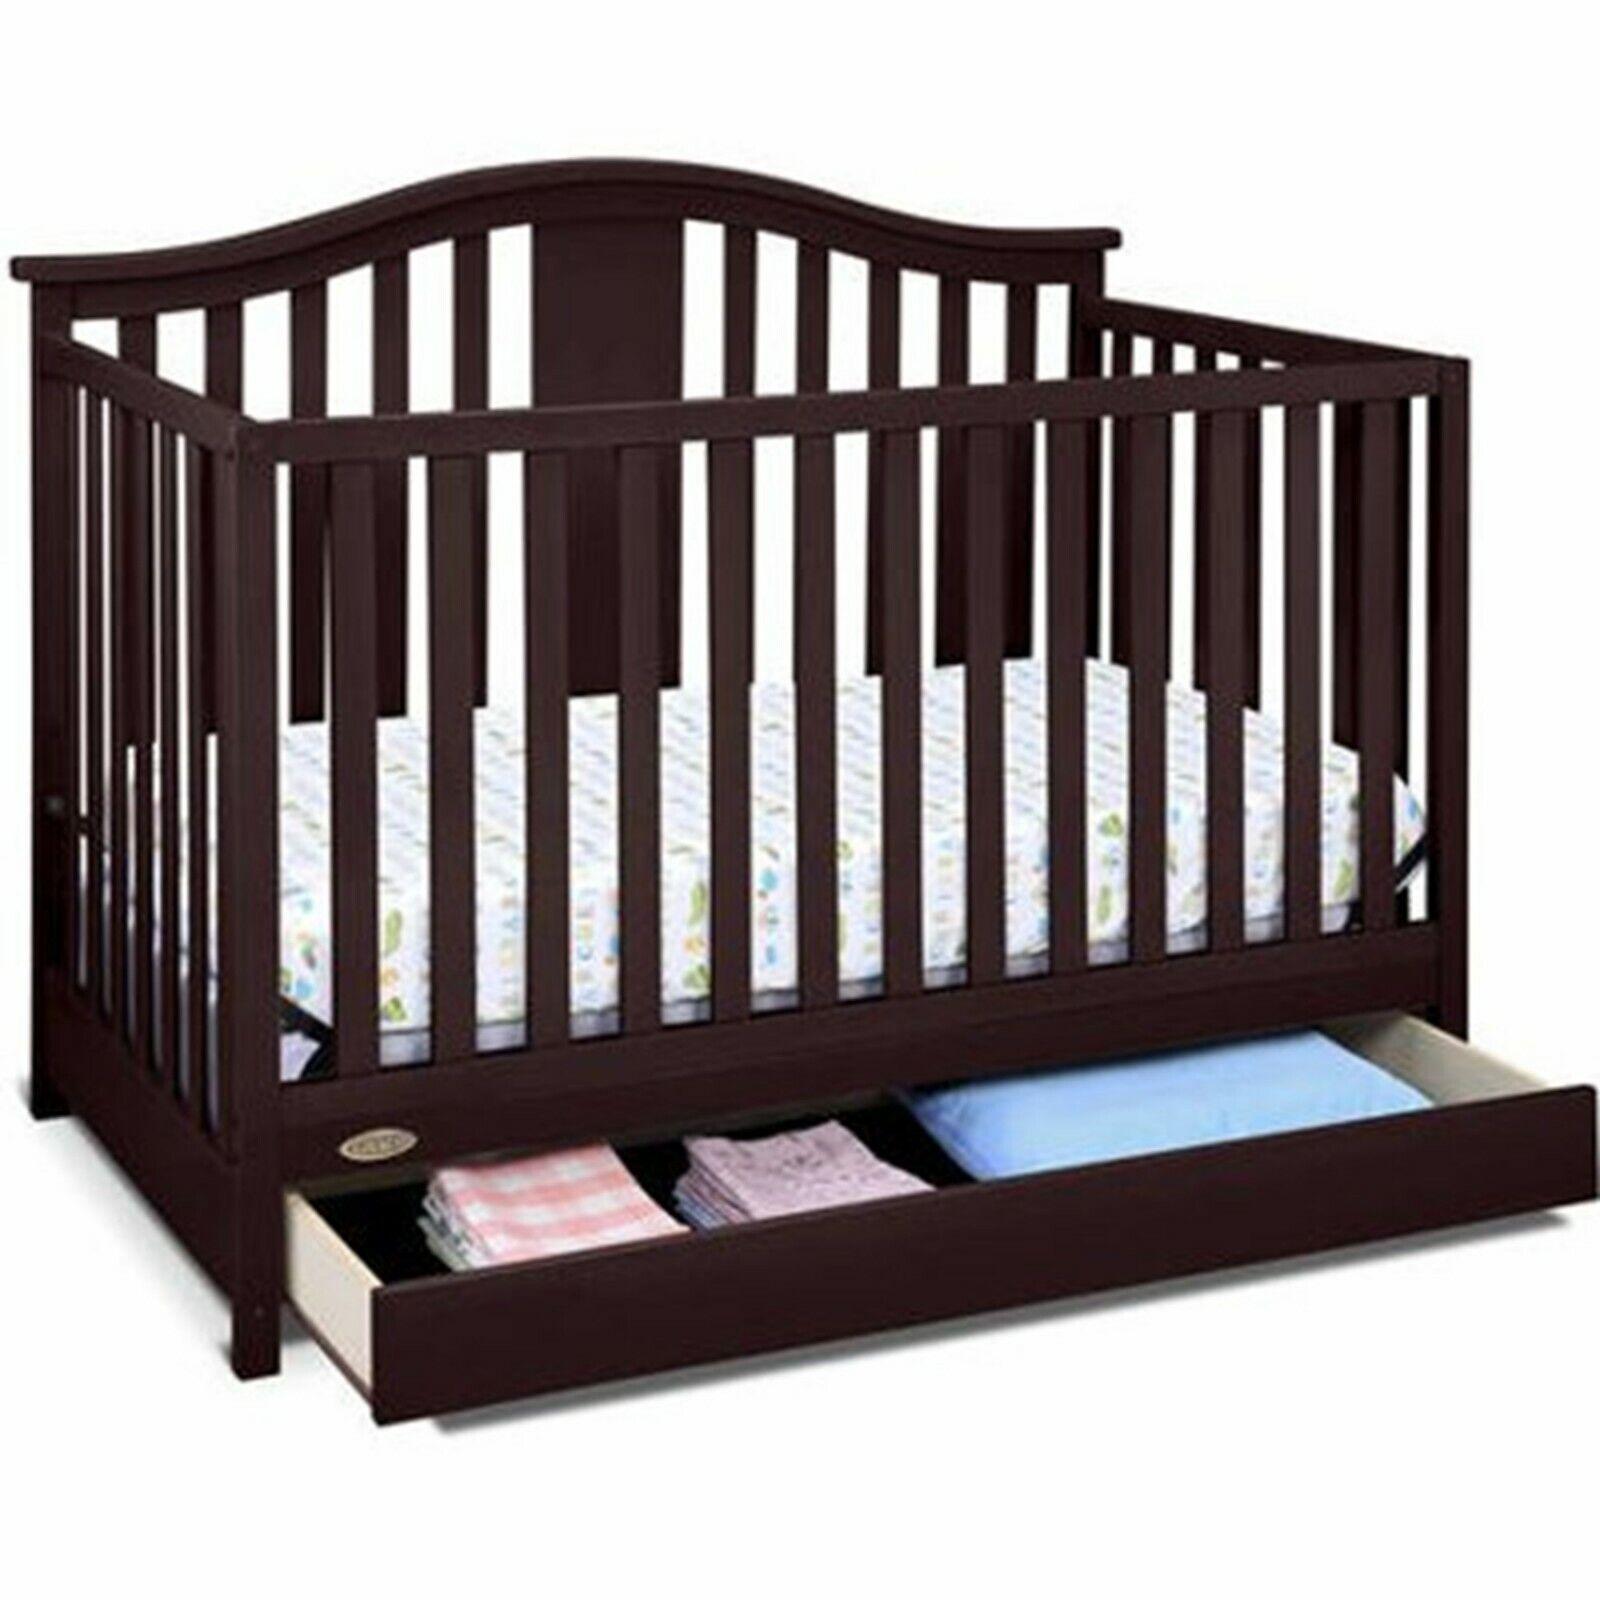 4-in-1 Convertible Crib with Drawer Kids Toddler Nursery Fur